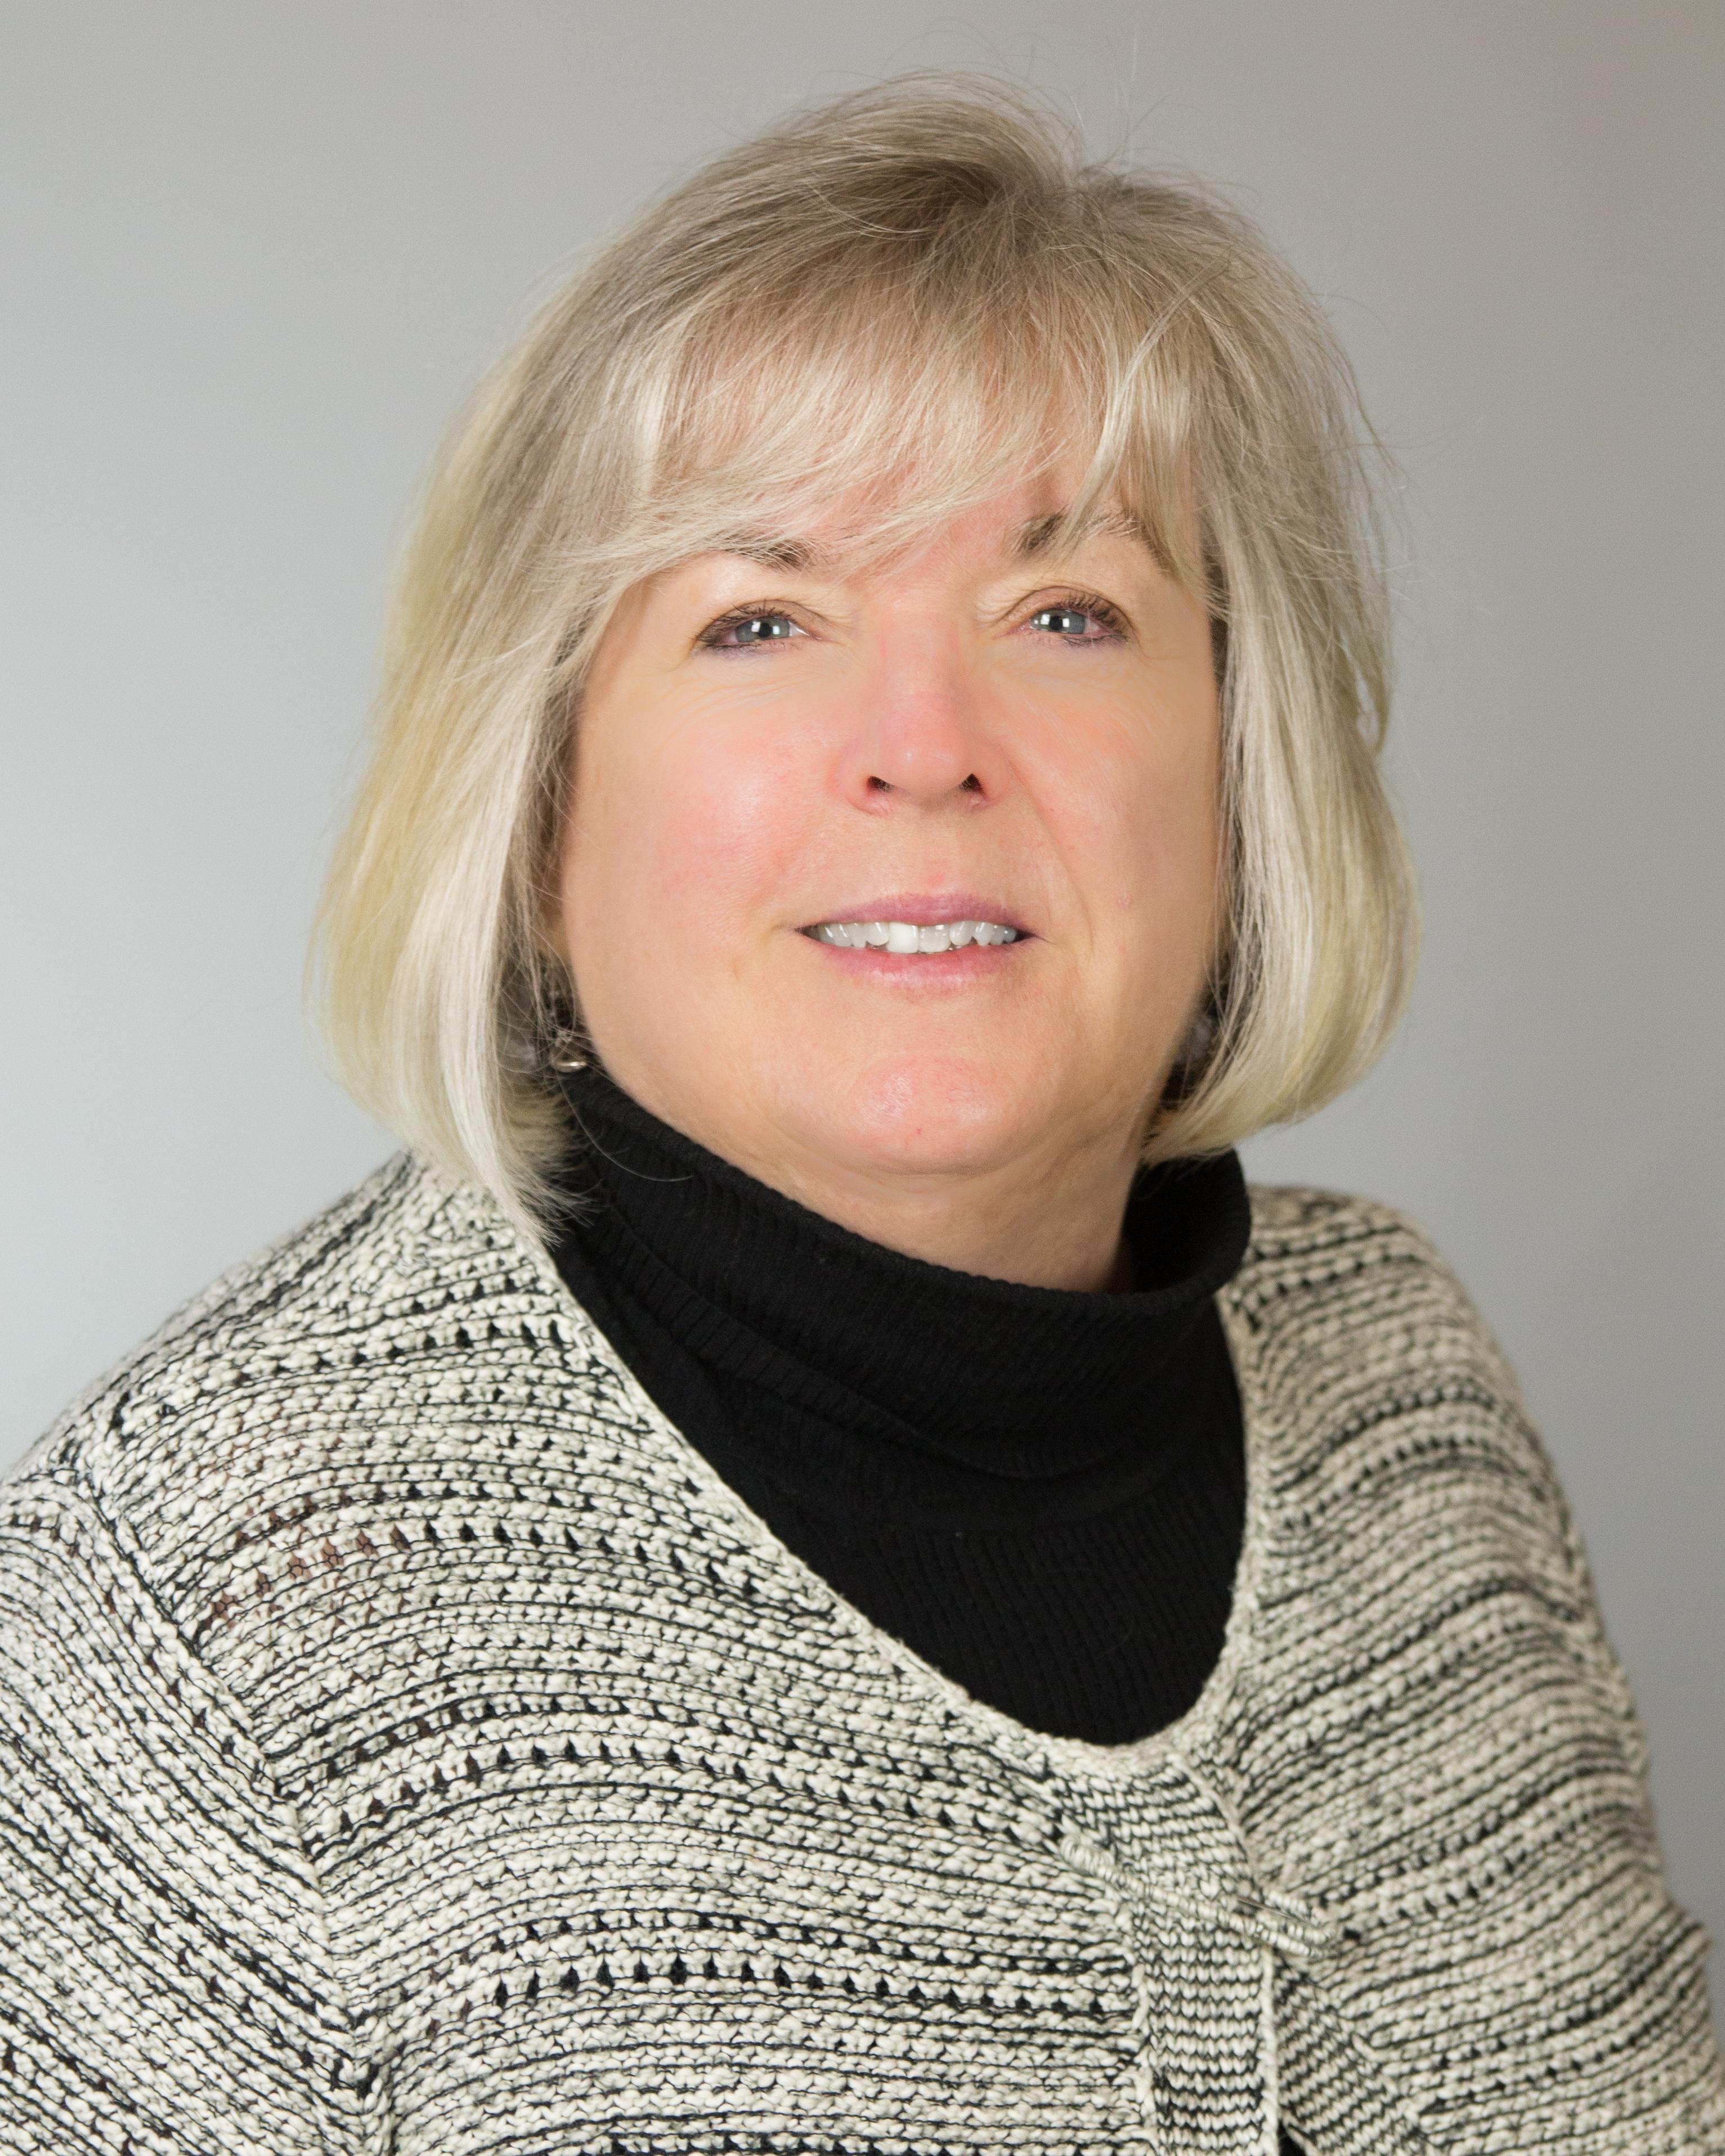 Cheryl Slobodian